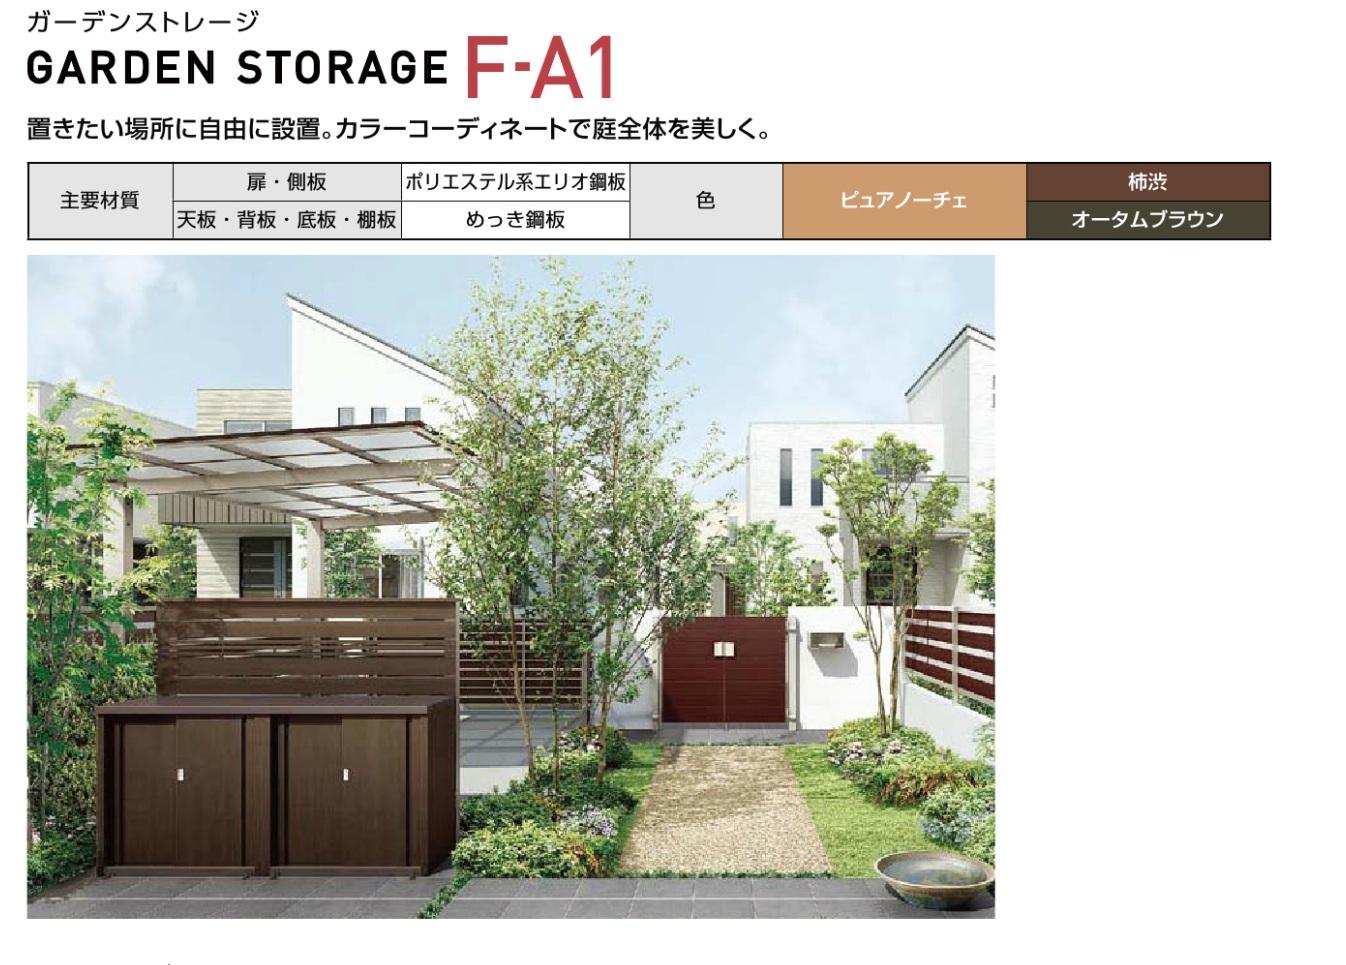 ★LIXIL TOEX ガーデンストレージ F-A1 施錠機能付き★